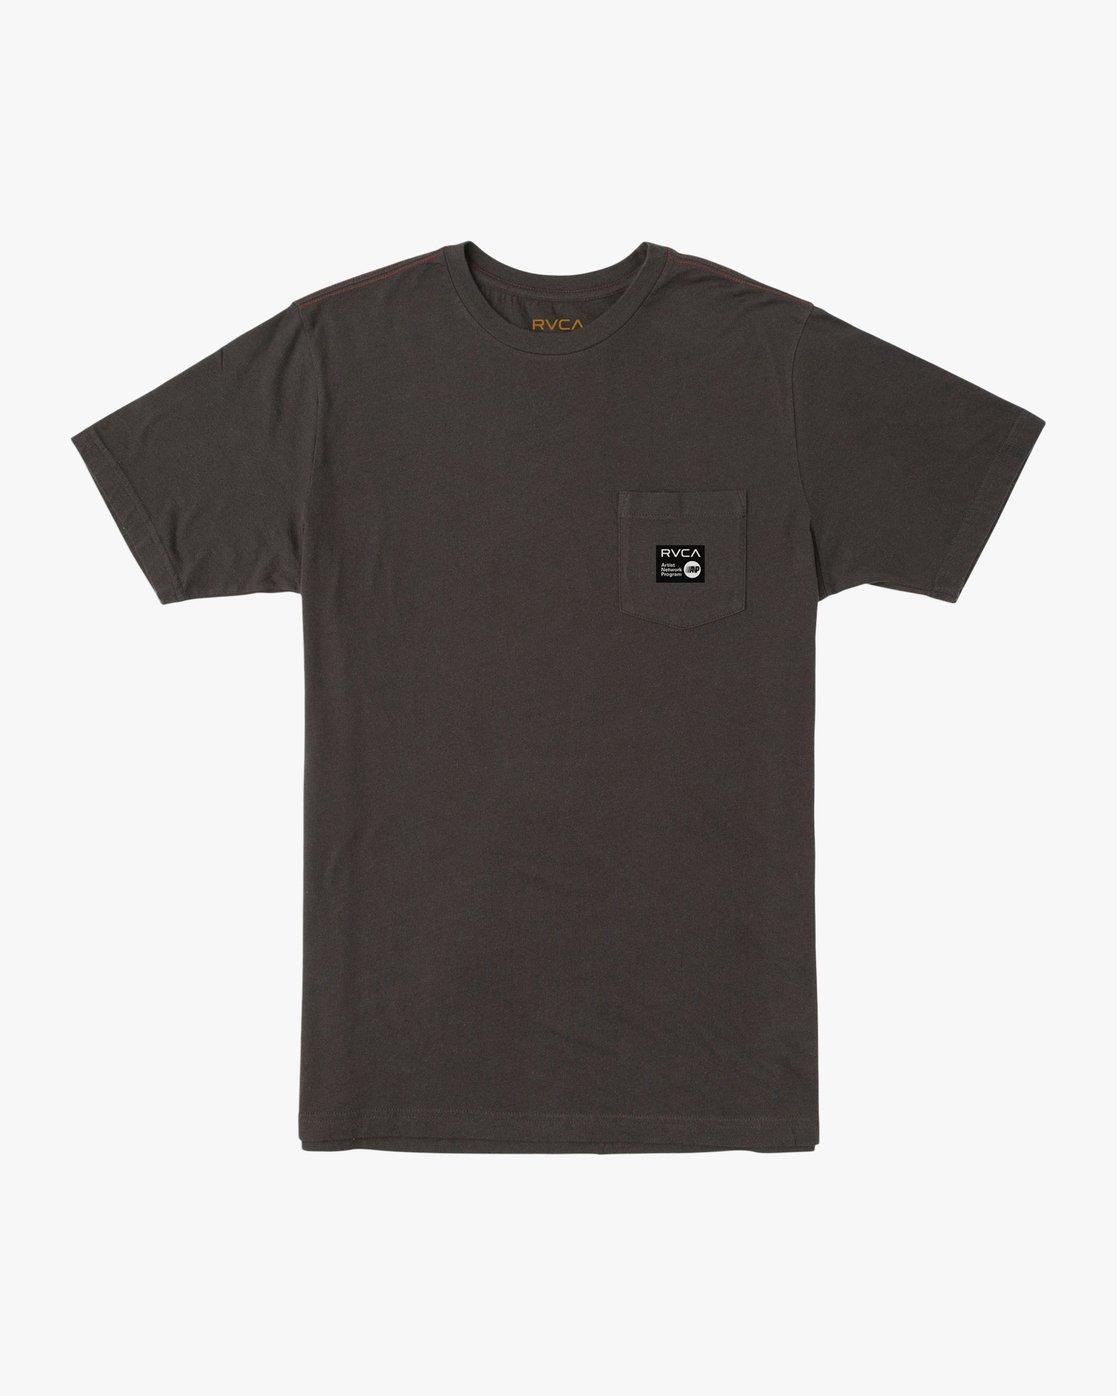 0 ANP Pocket T-Shirt Black M436TRAN RVCA